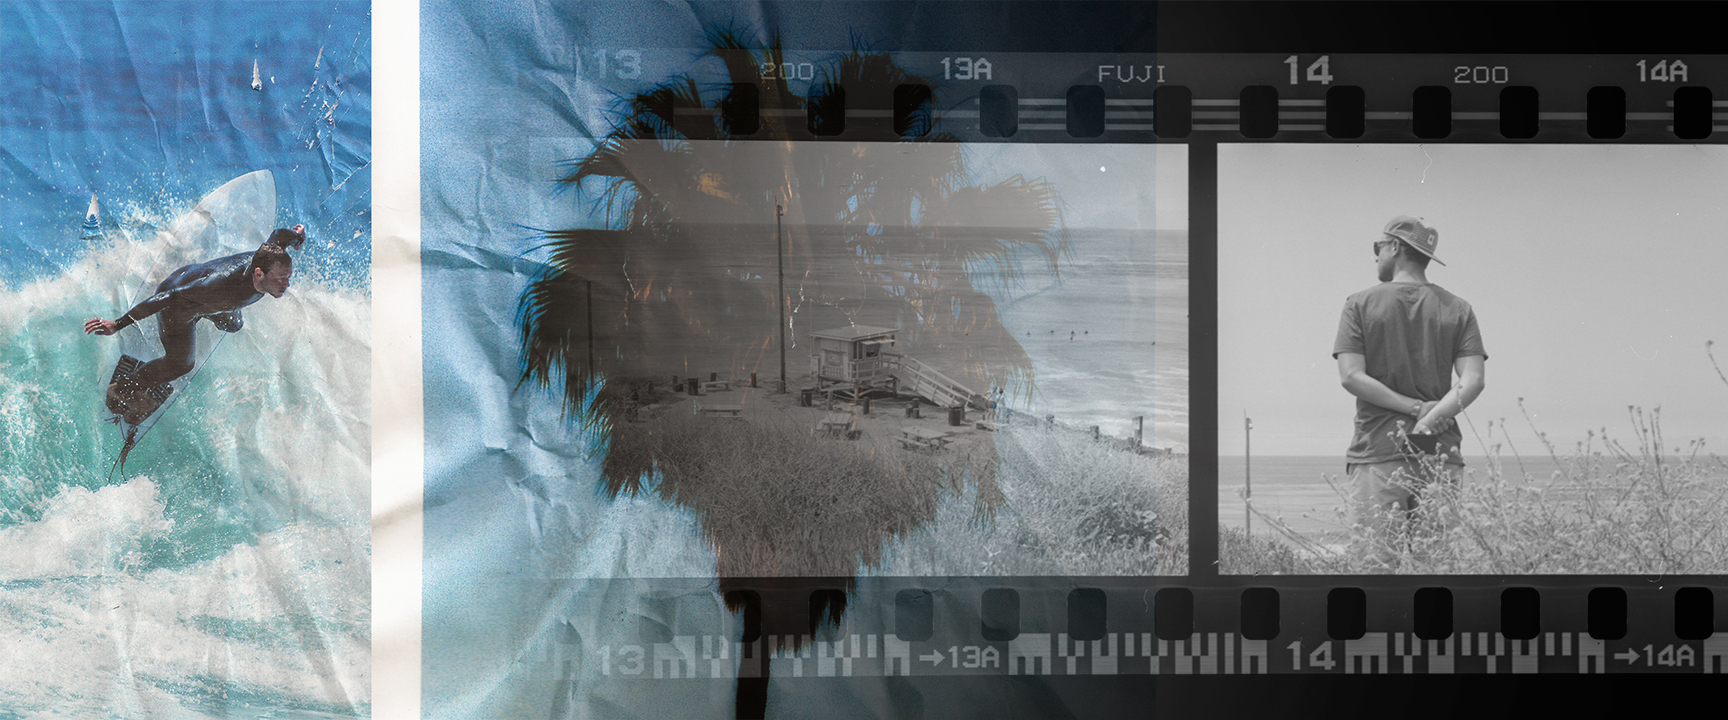 Untitled-2!!!.jpg